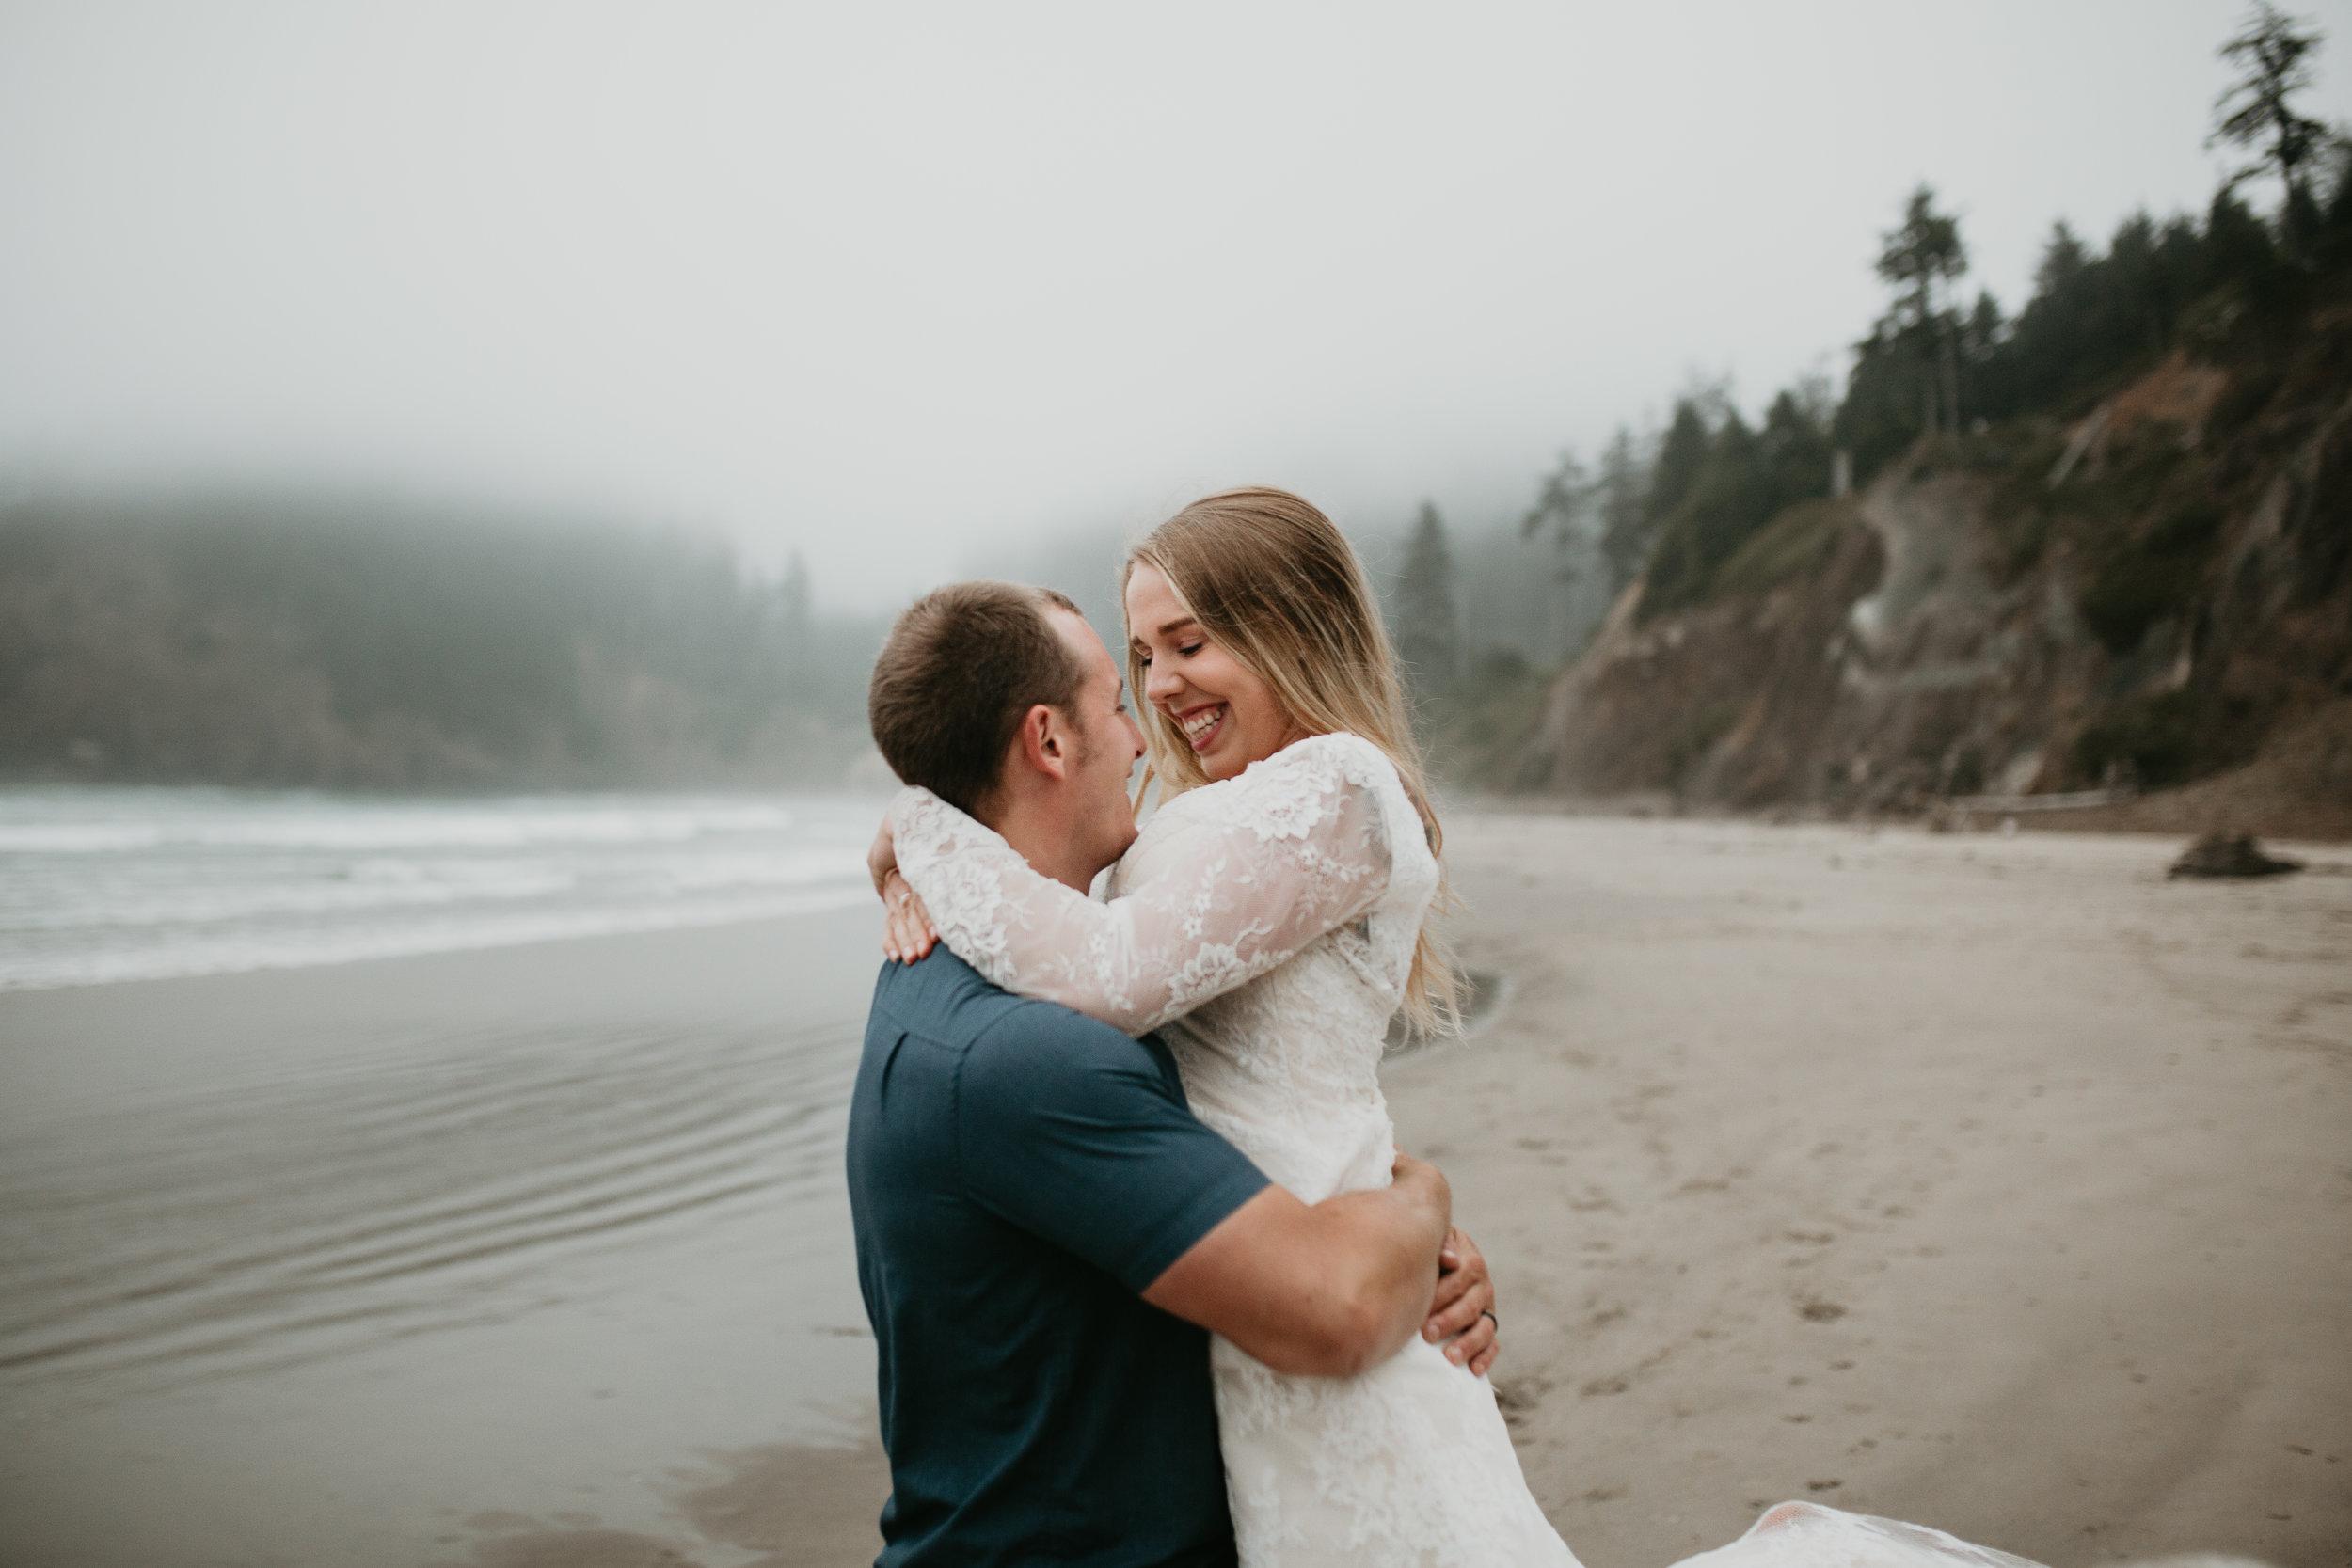 nicole-daacke-photography-ecola-state-park-oregon-elopement-bridal-photos-photographer-for-cannon-beach-elopement-oregon-coast-elopement-photographer-foggy-summer-elopement-cannon-beach-best-adventure-elopement-photographer-7067.jpg